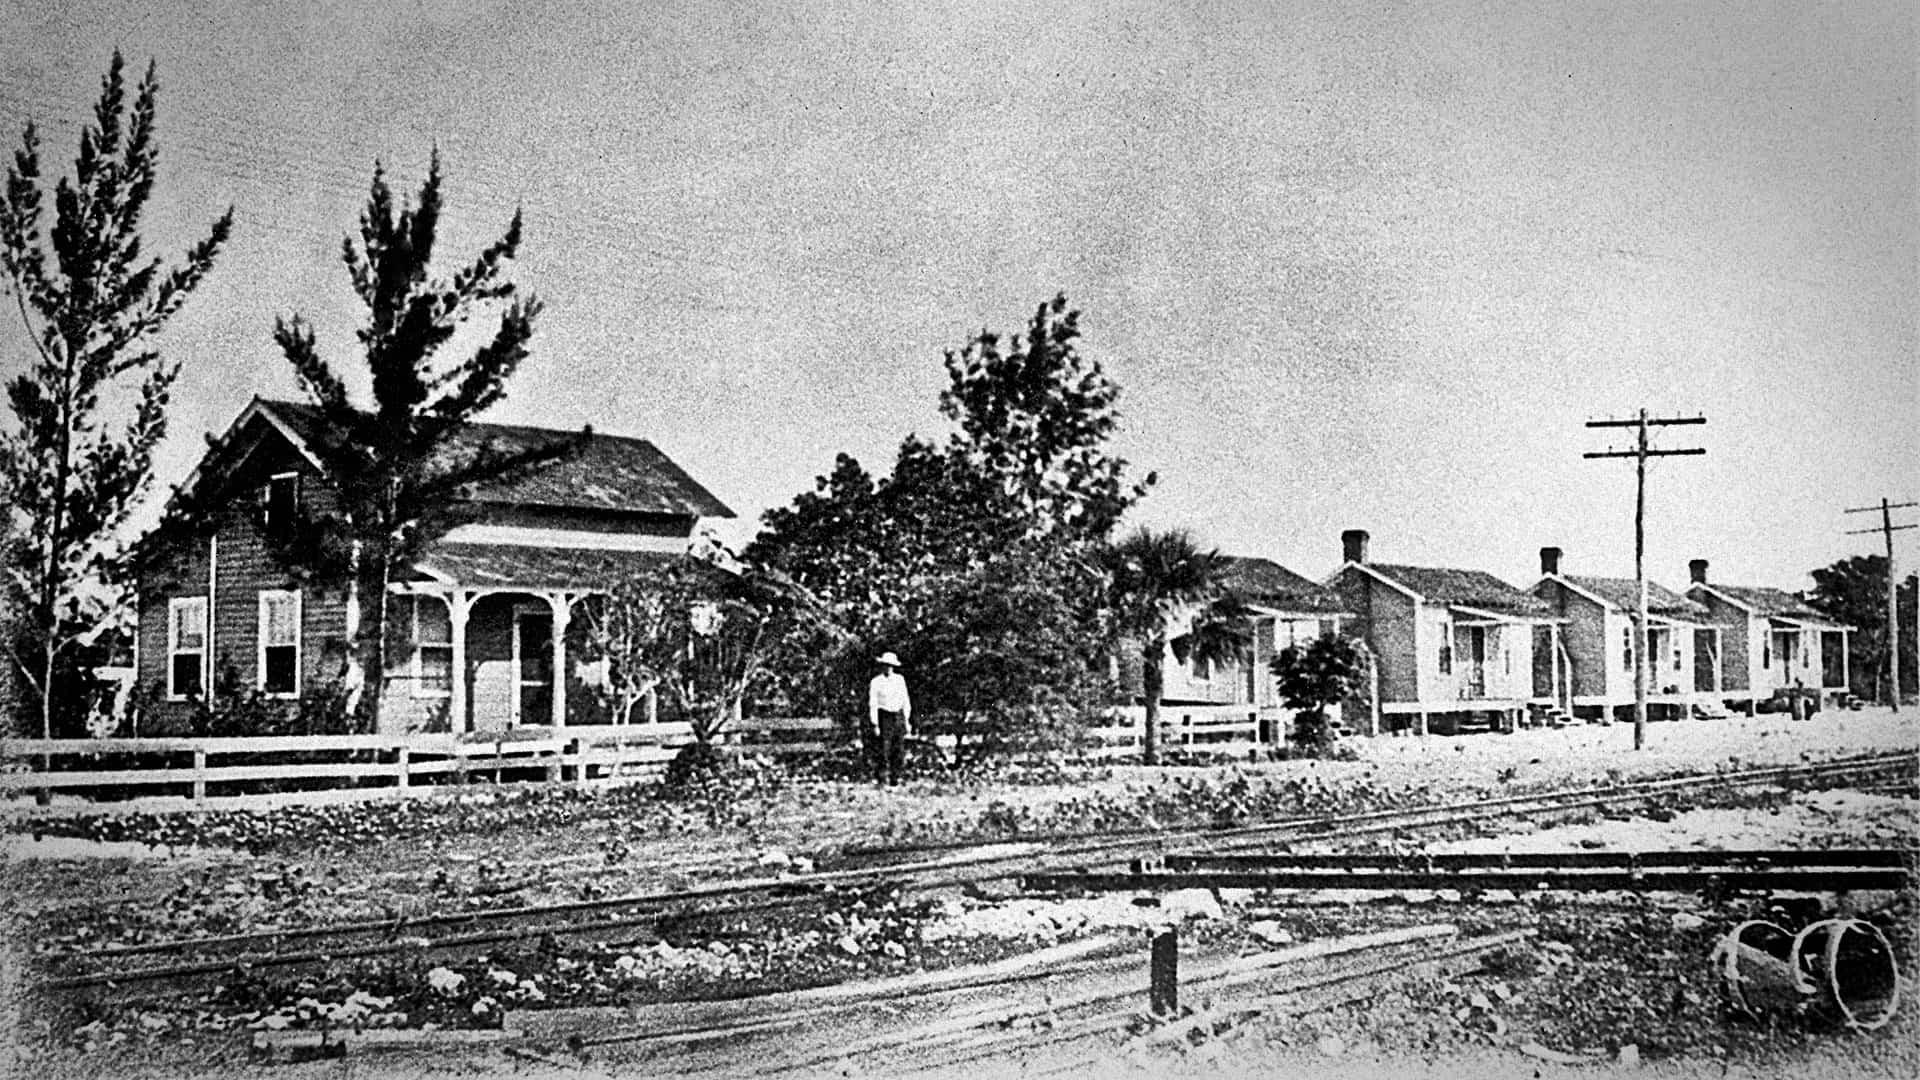 The Deerfield Beach Railroad